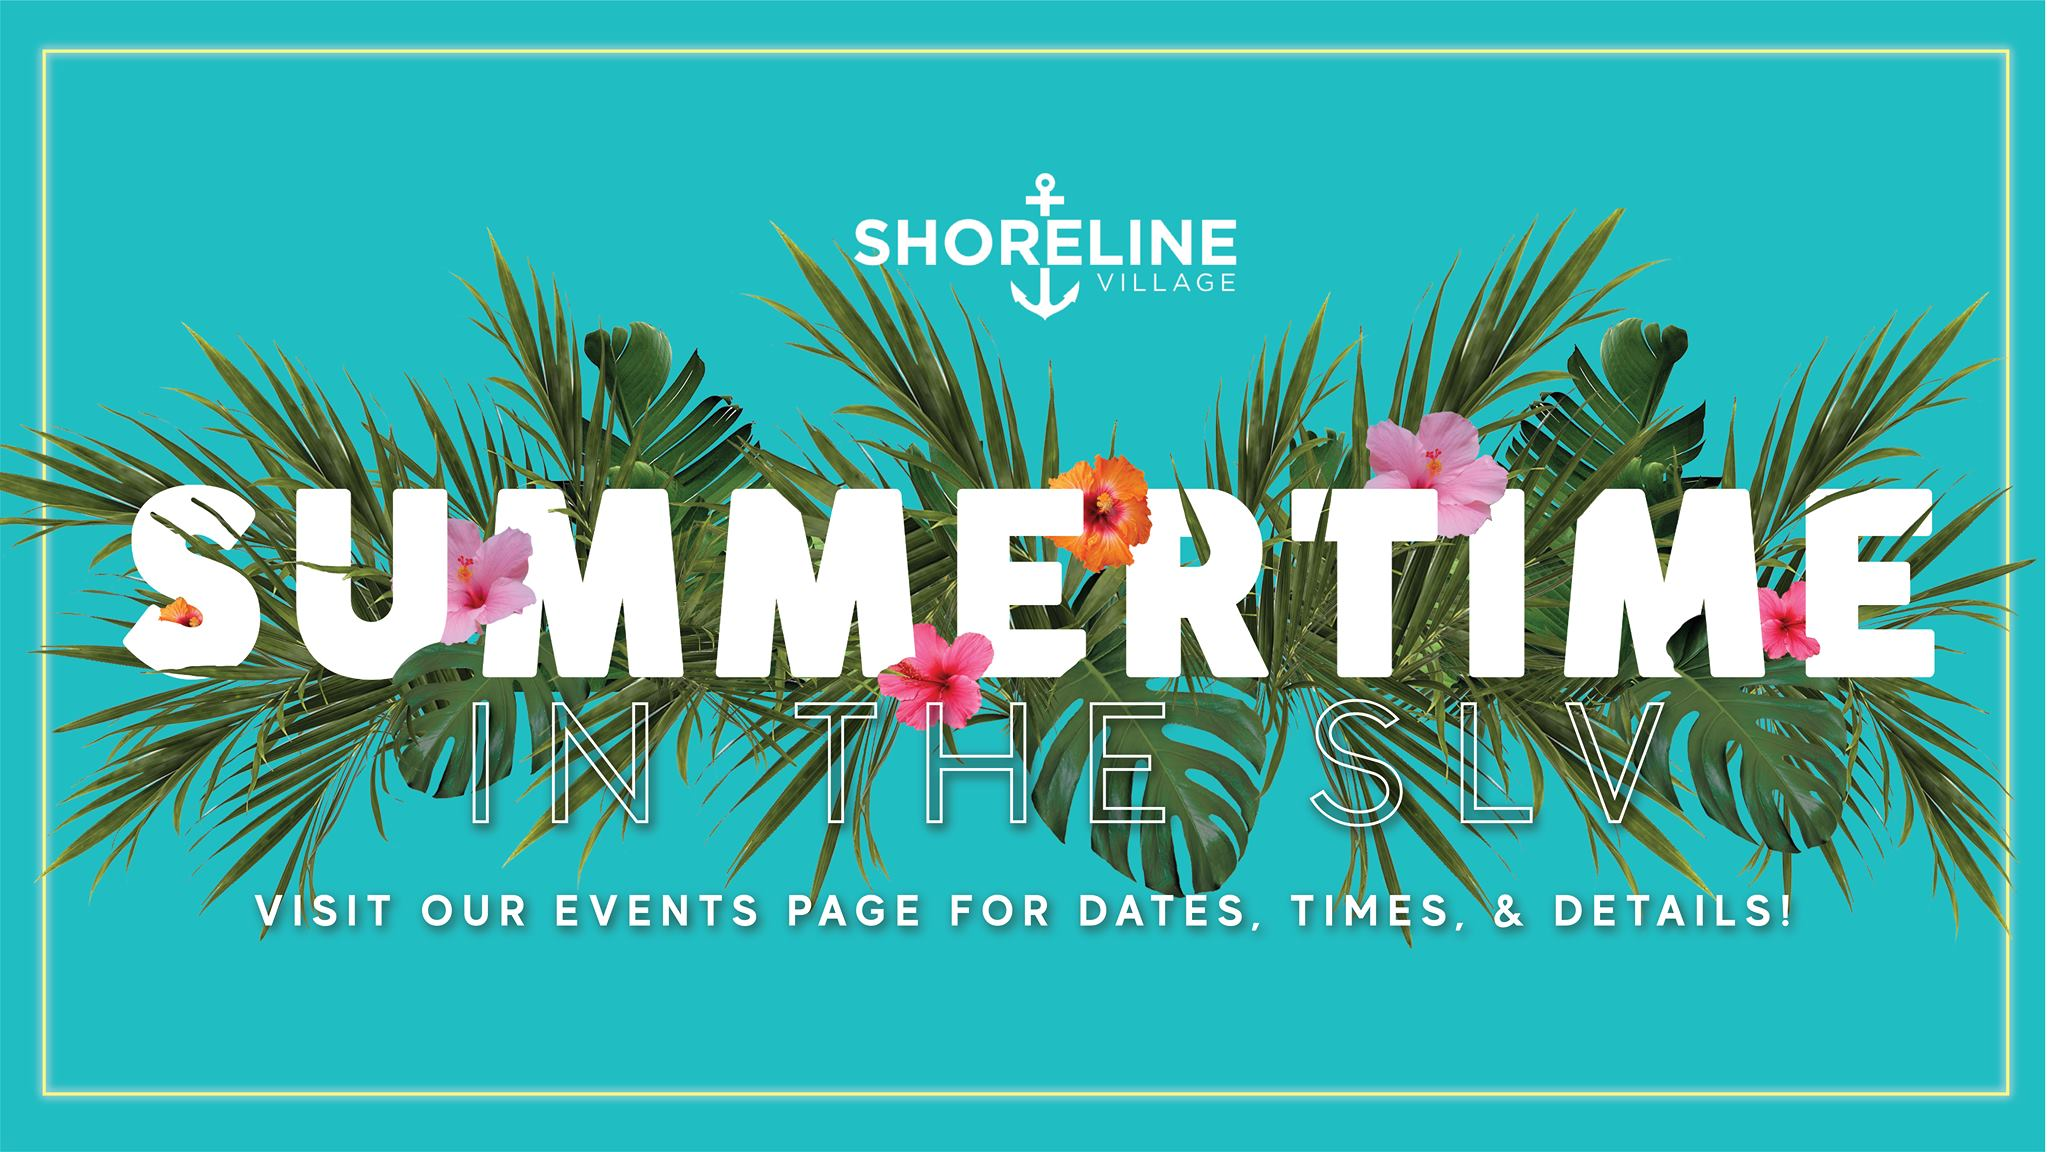 Summer Concert Series at Shoreline Village 2019